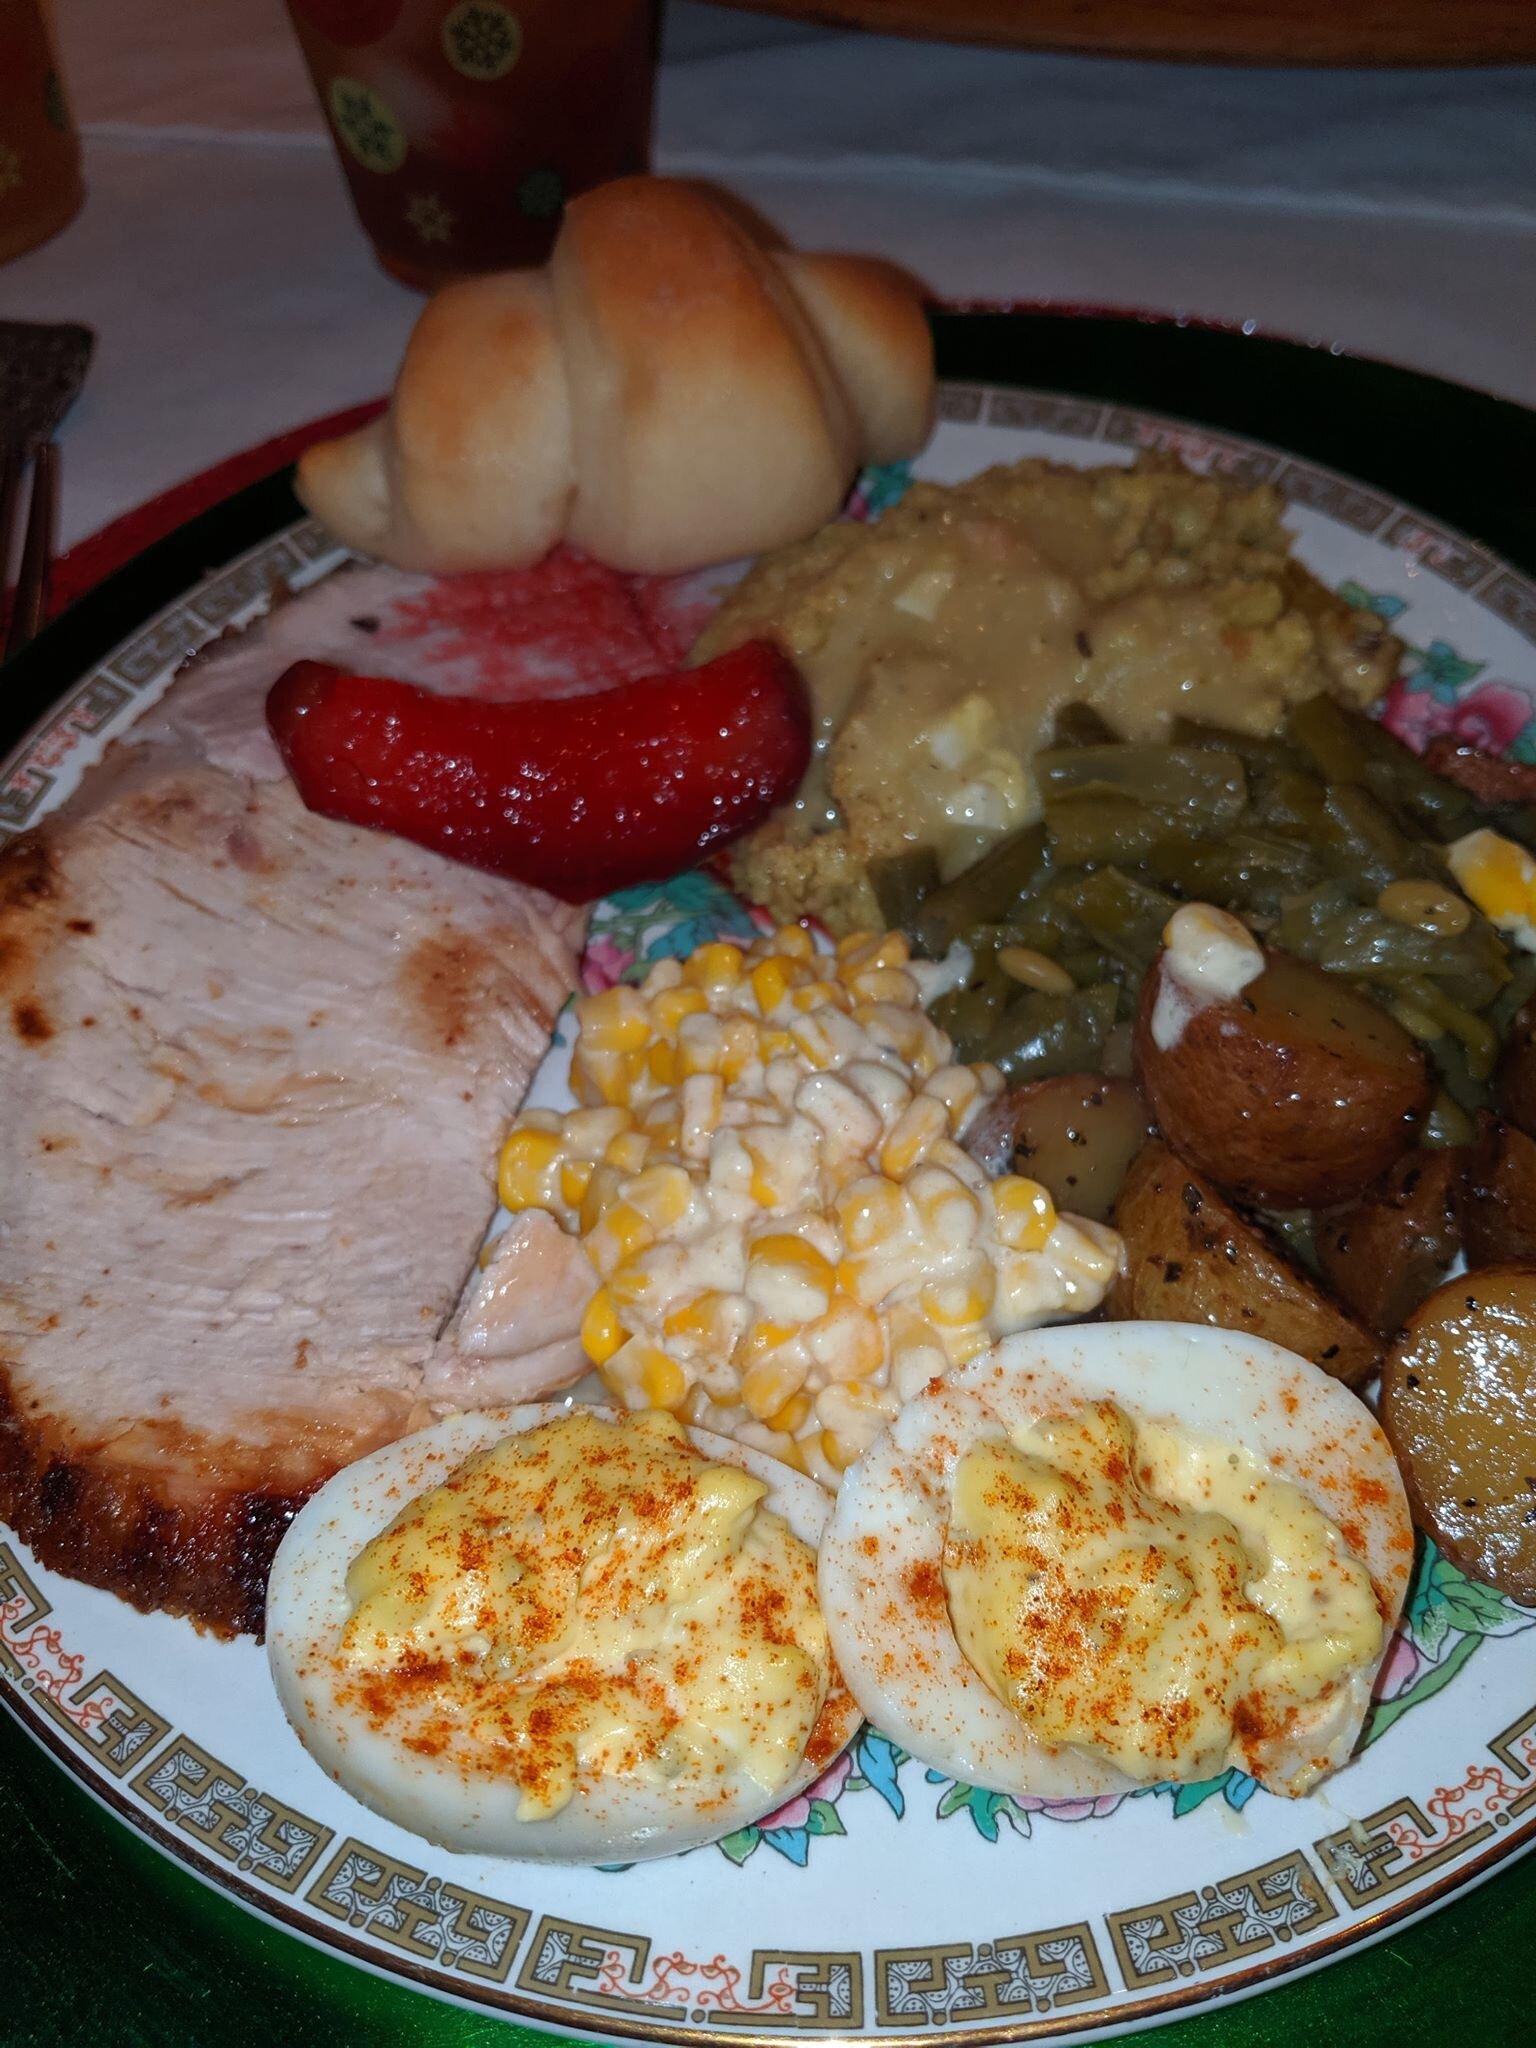 My Thanksgiving feast.